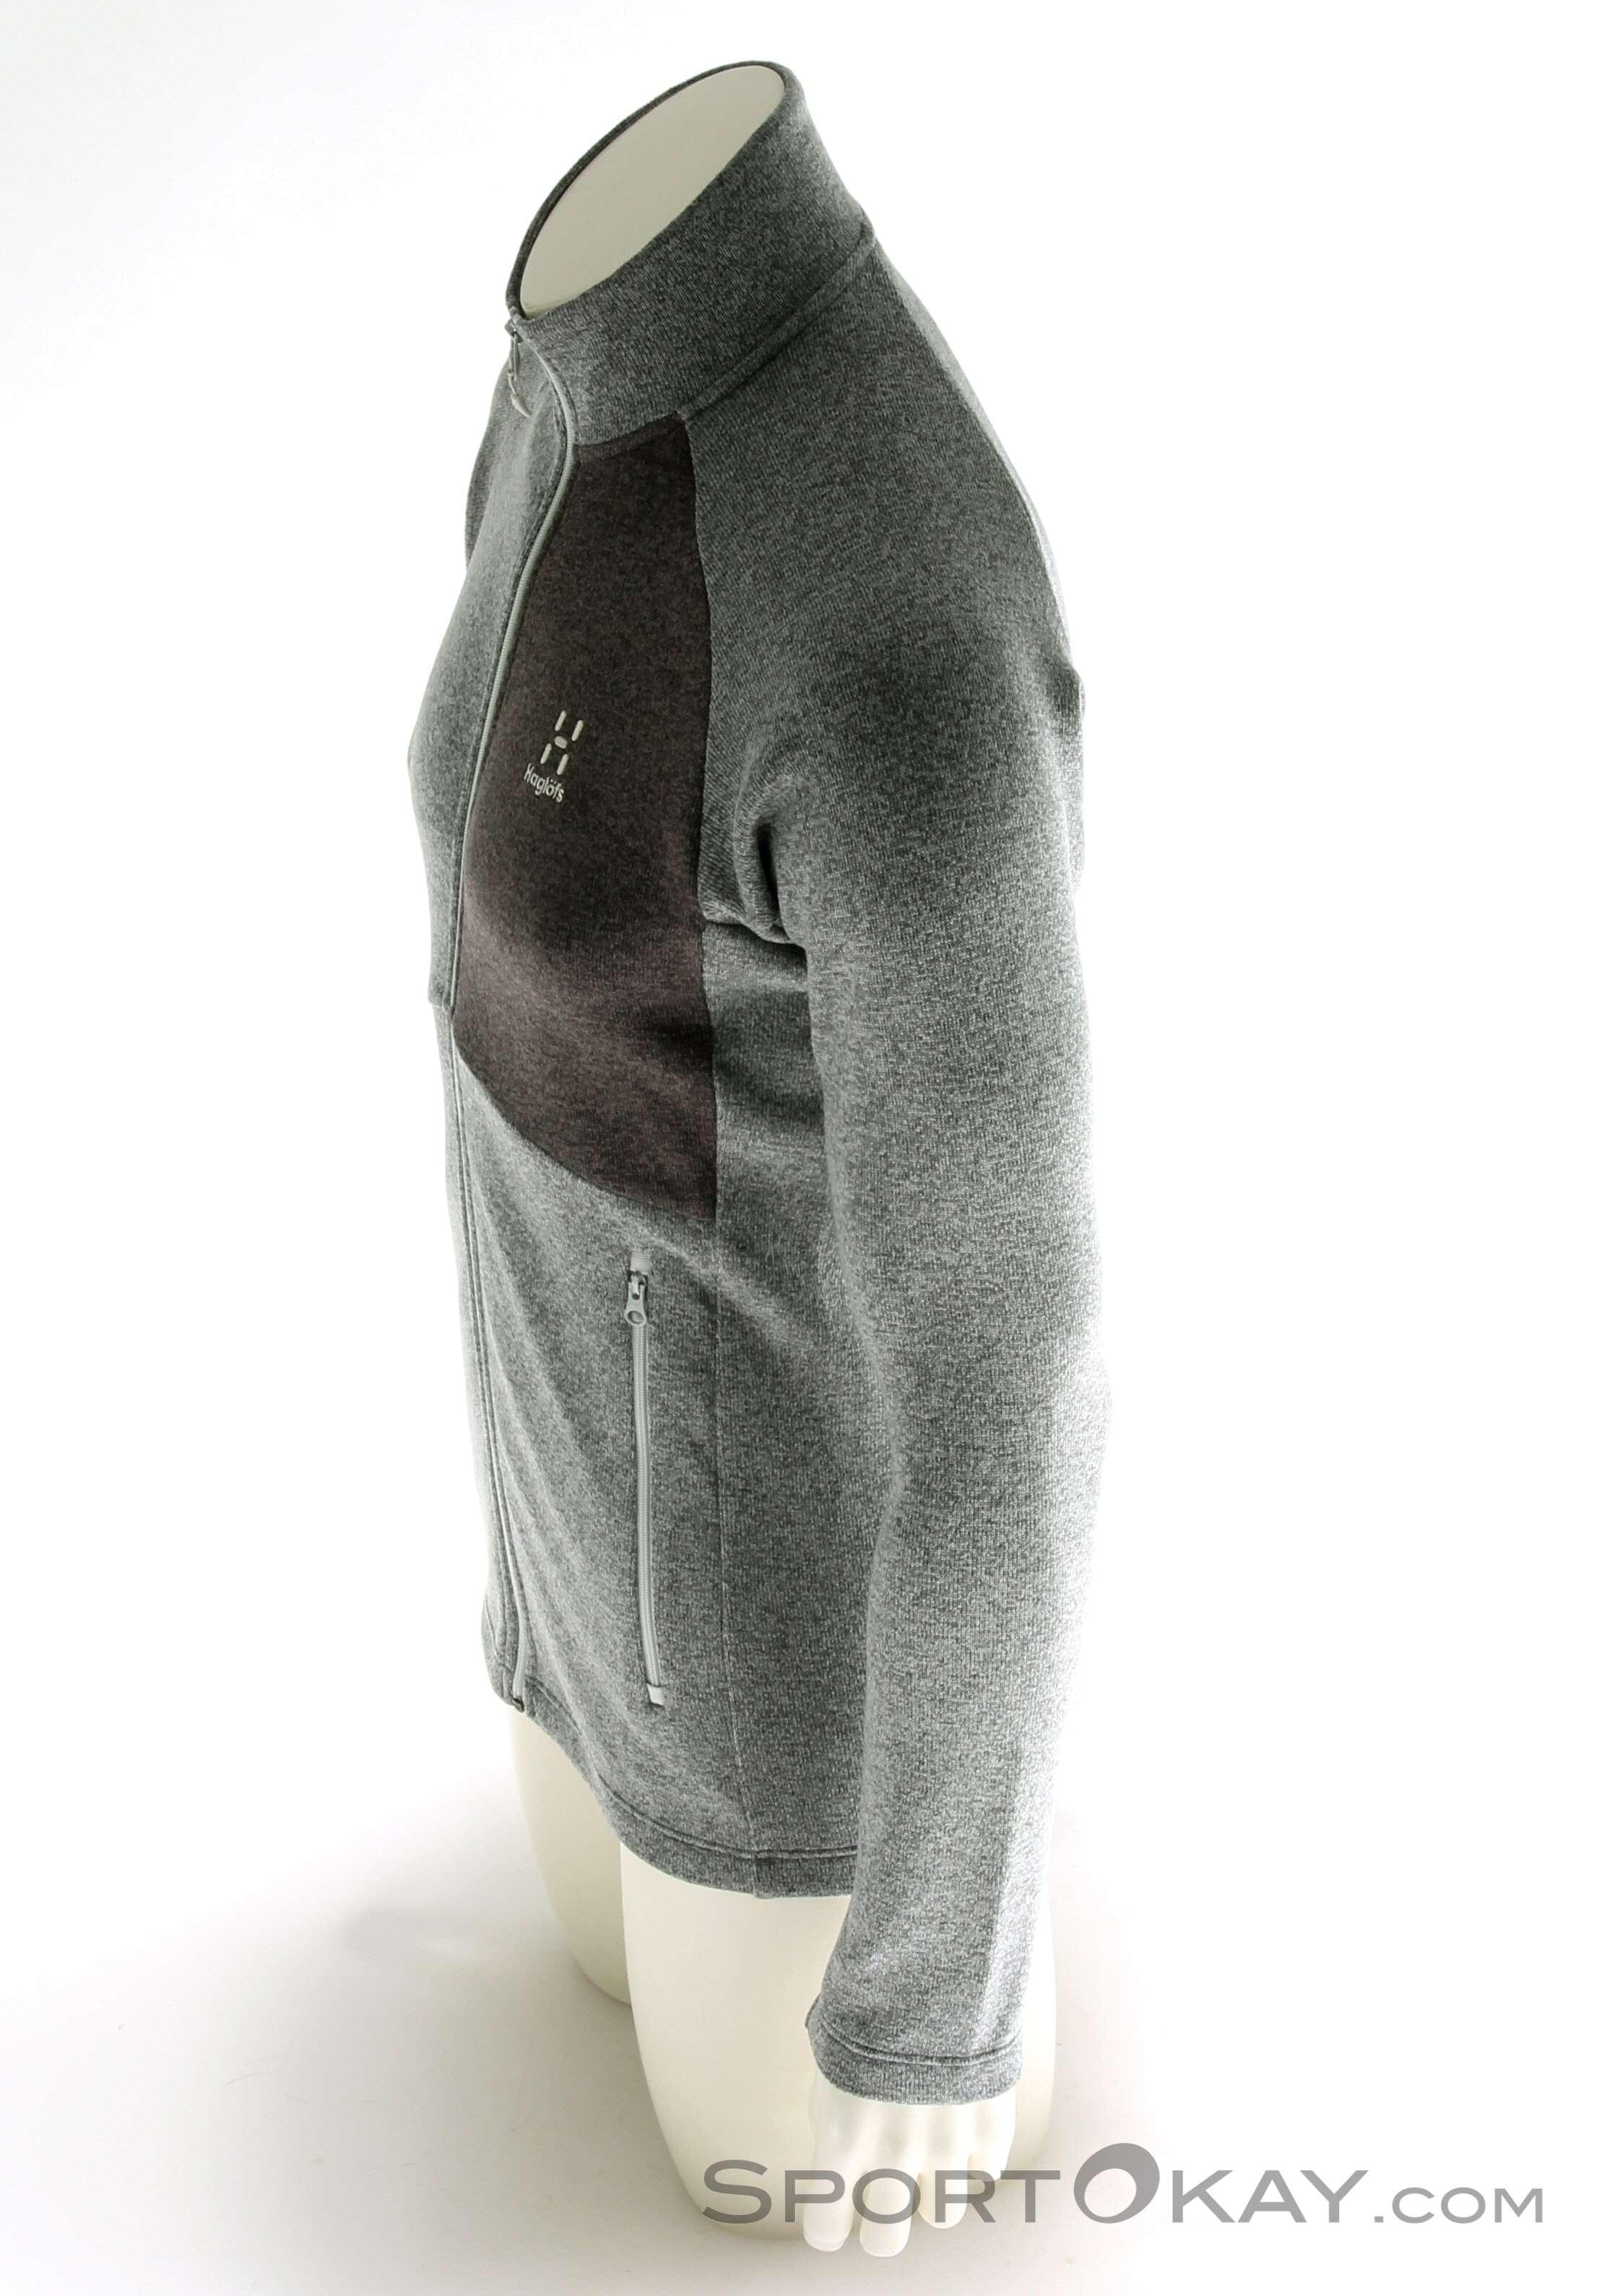 Maglia Outdoor Nimble Haglöfs Abbigliamento Maglie Jacket Uomo nwFTPPq0t